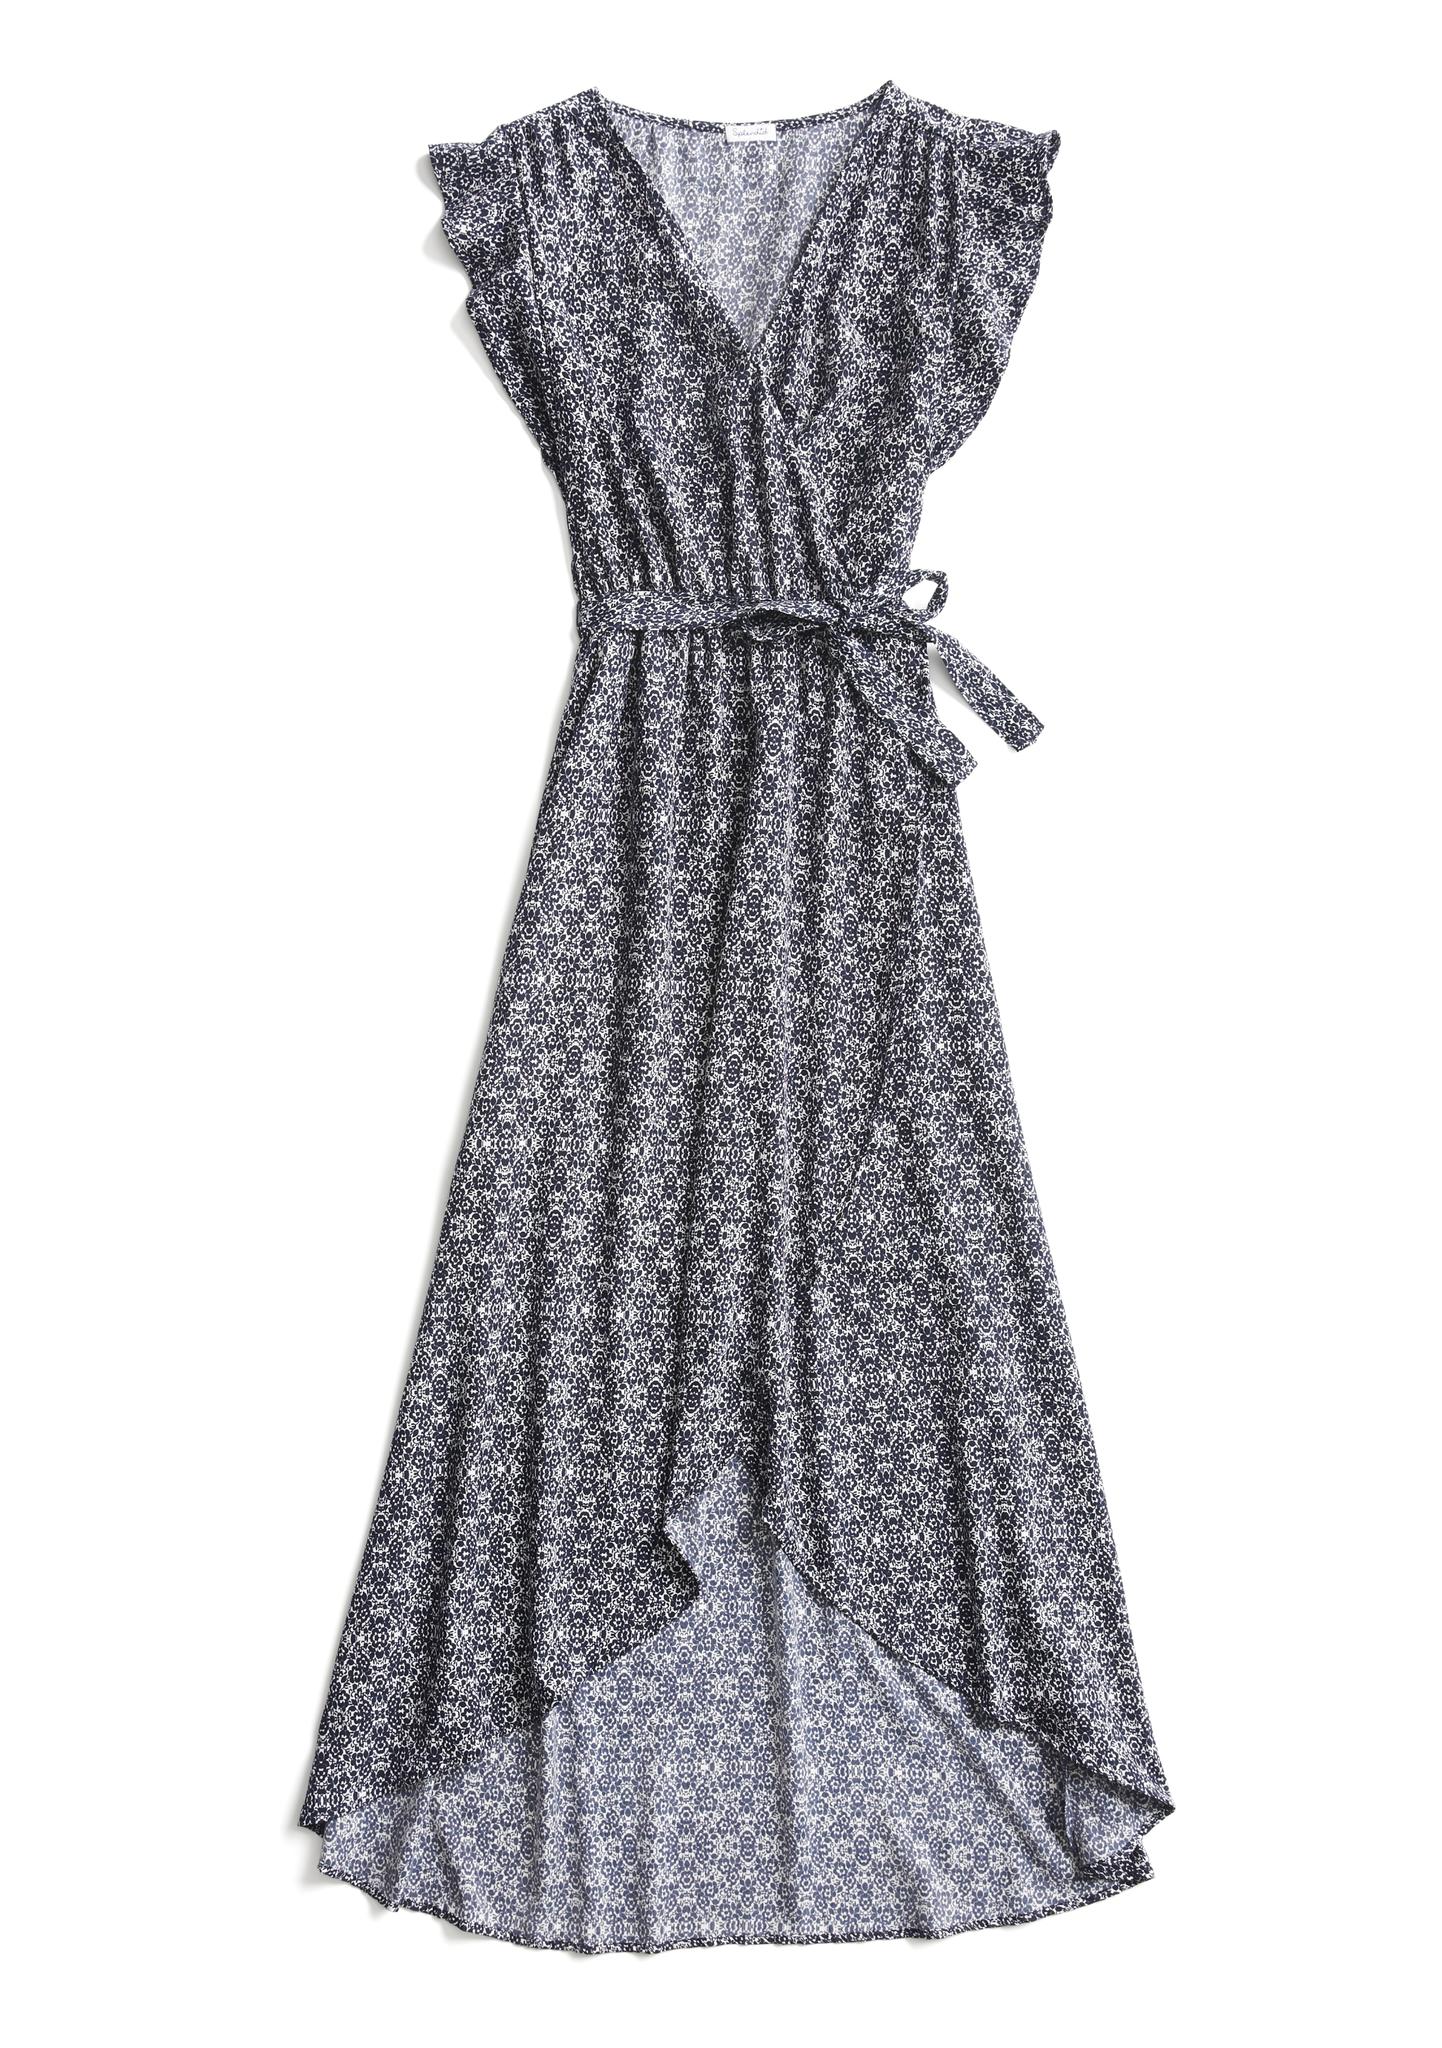 Stitch Fix Spring Stylist Picks: Printed floral wrap maxi